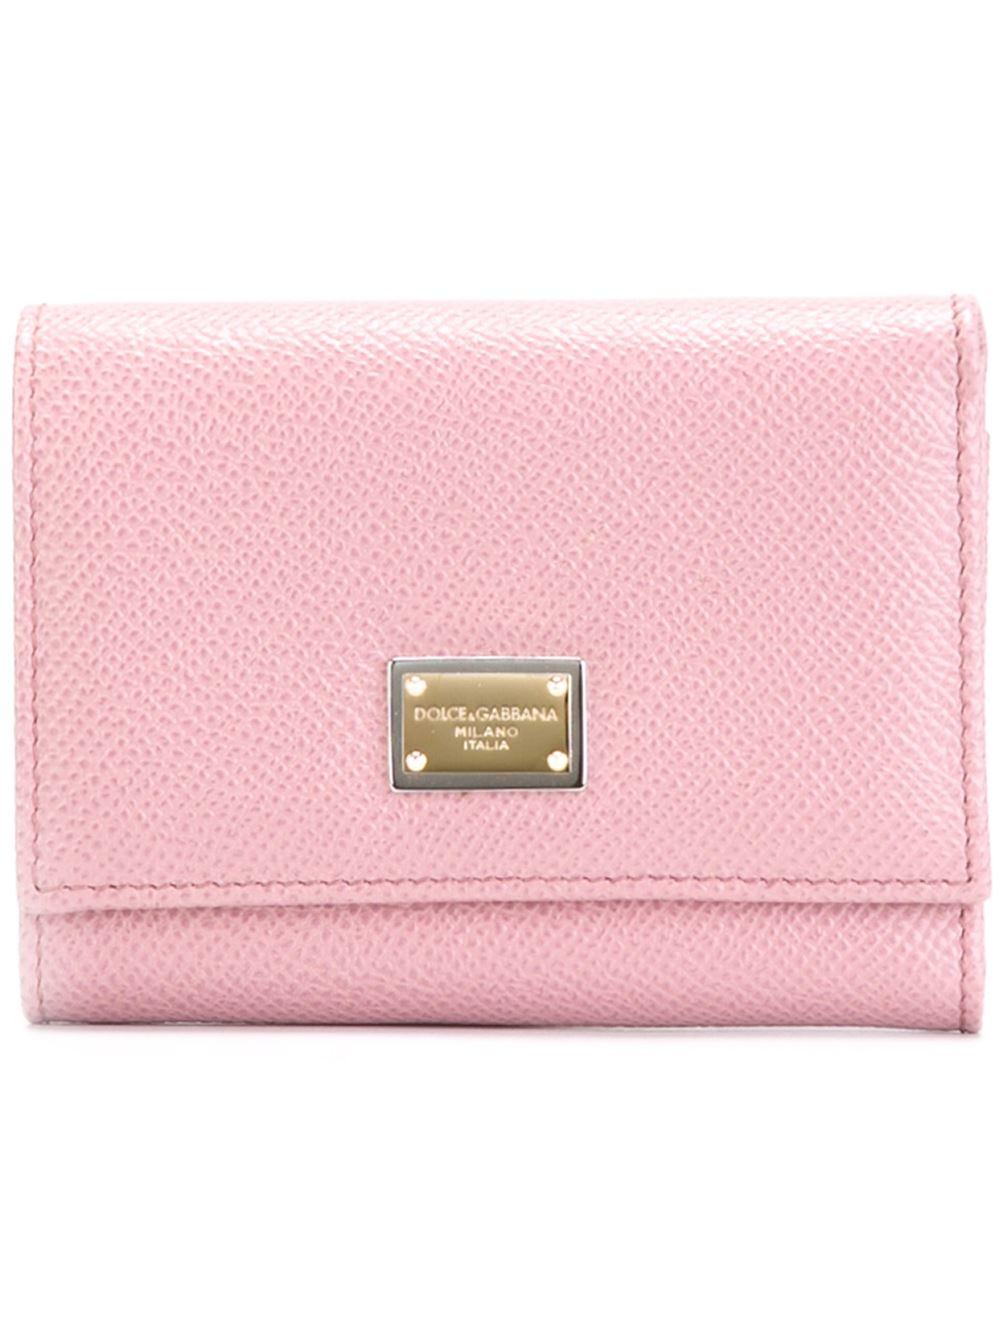 Dolce & Gabbana Small logo wallet zwjCdYL818